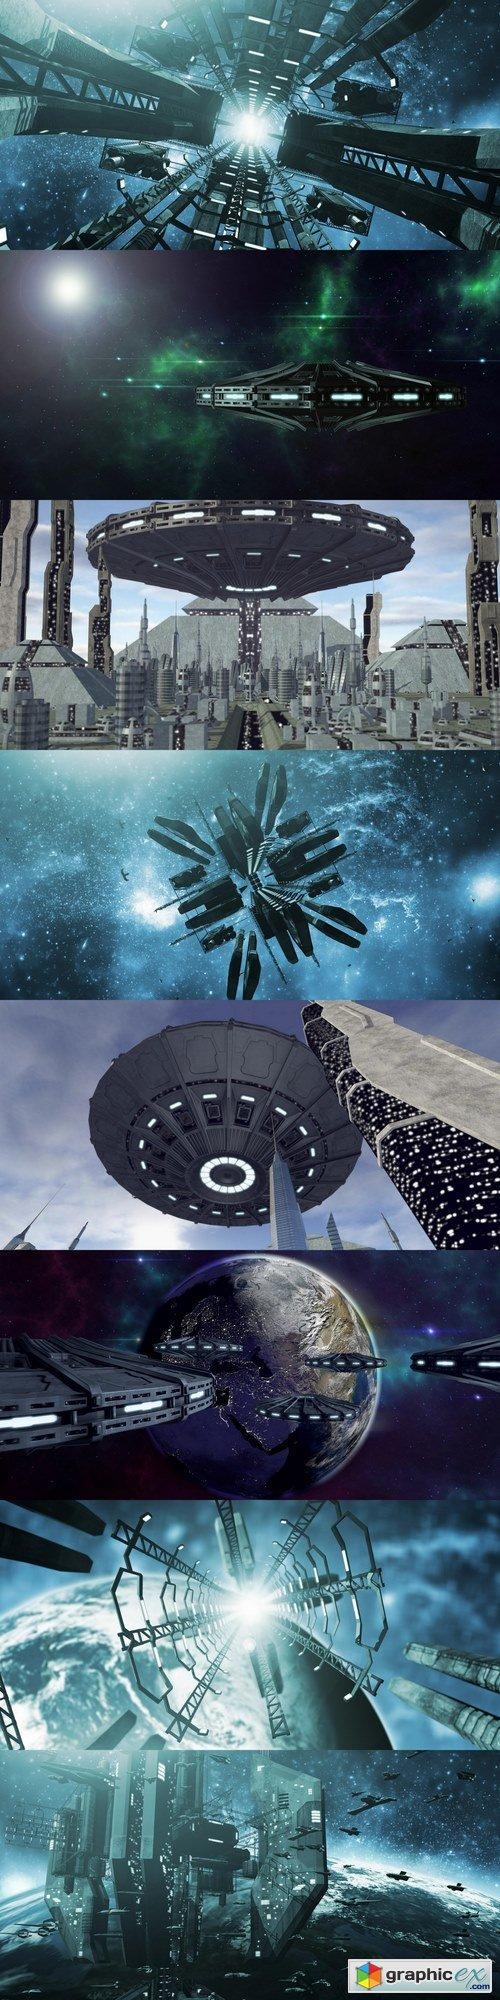 UFO flying above futuristic pyramid city